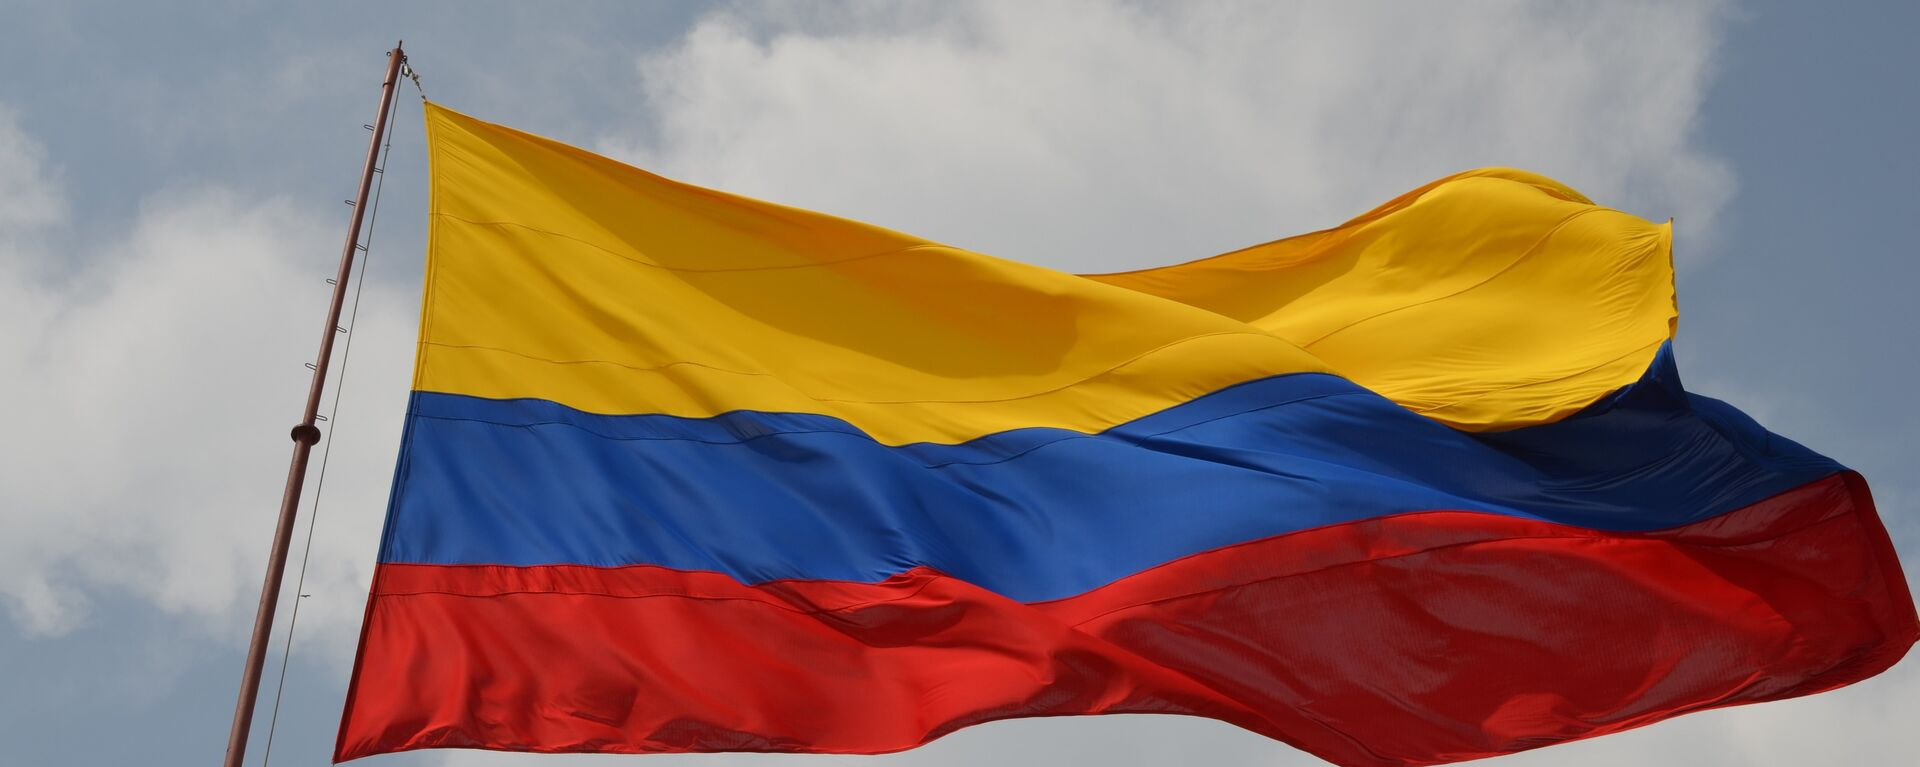 Bandera de Colombia - Sputnik Mundo, 1920, 20.07.2021